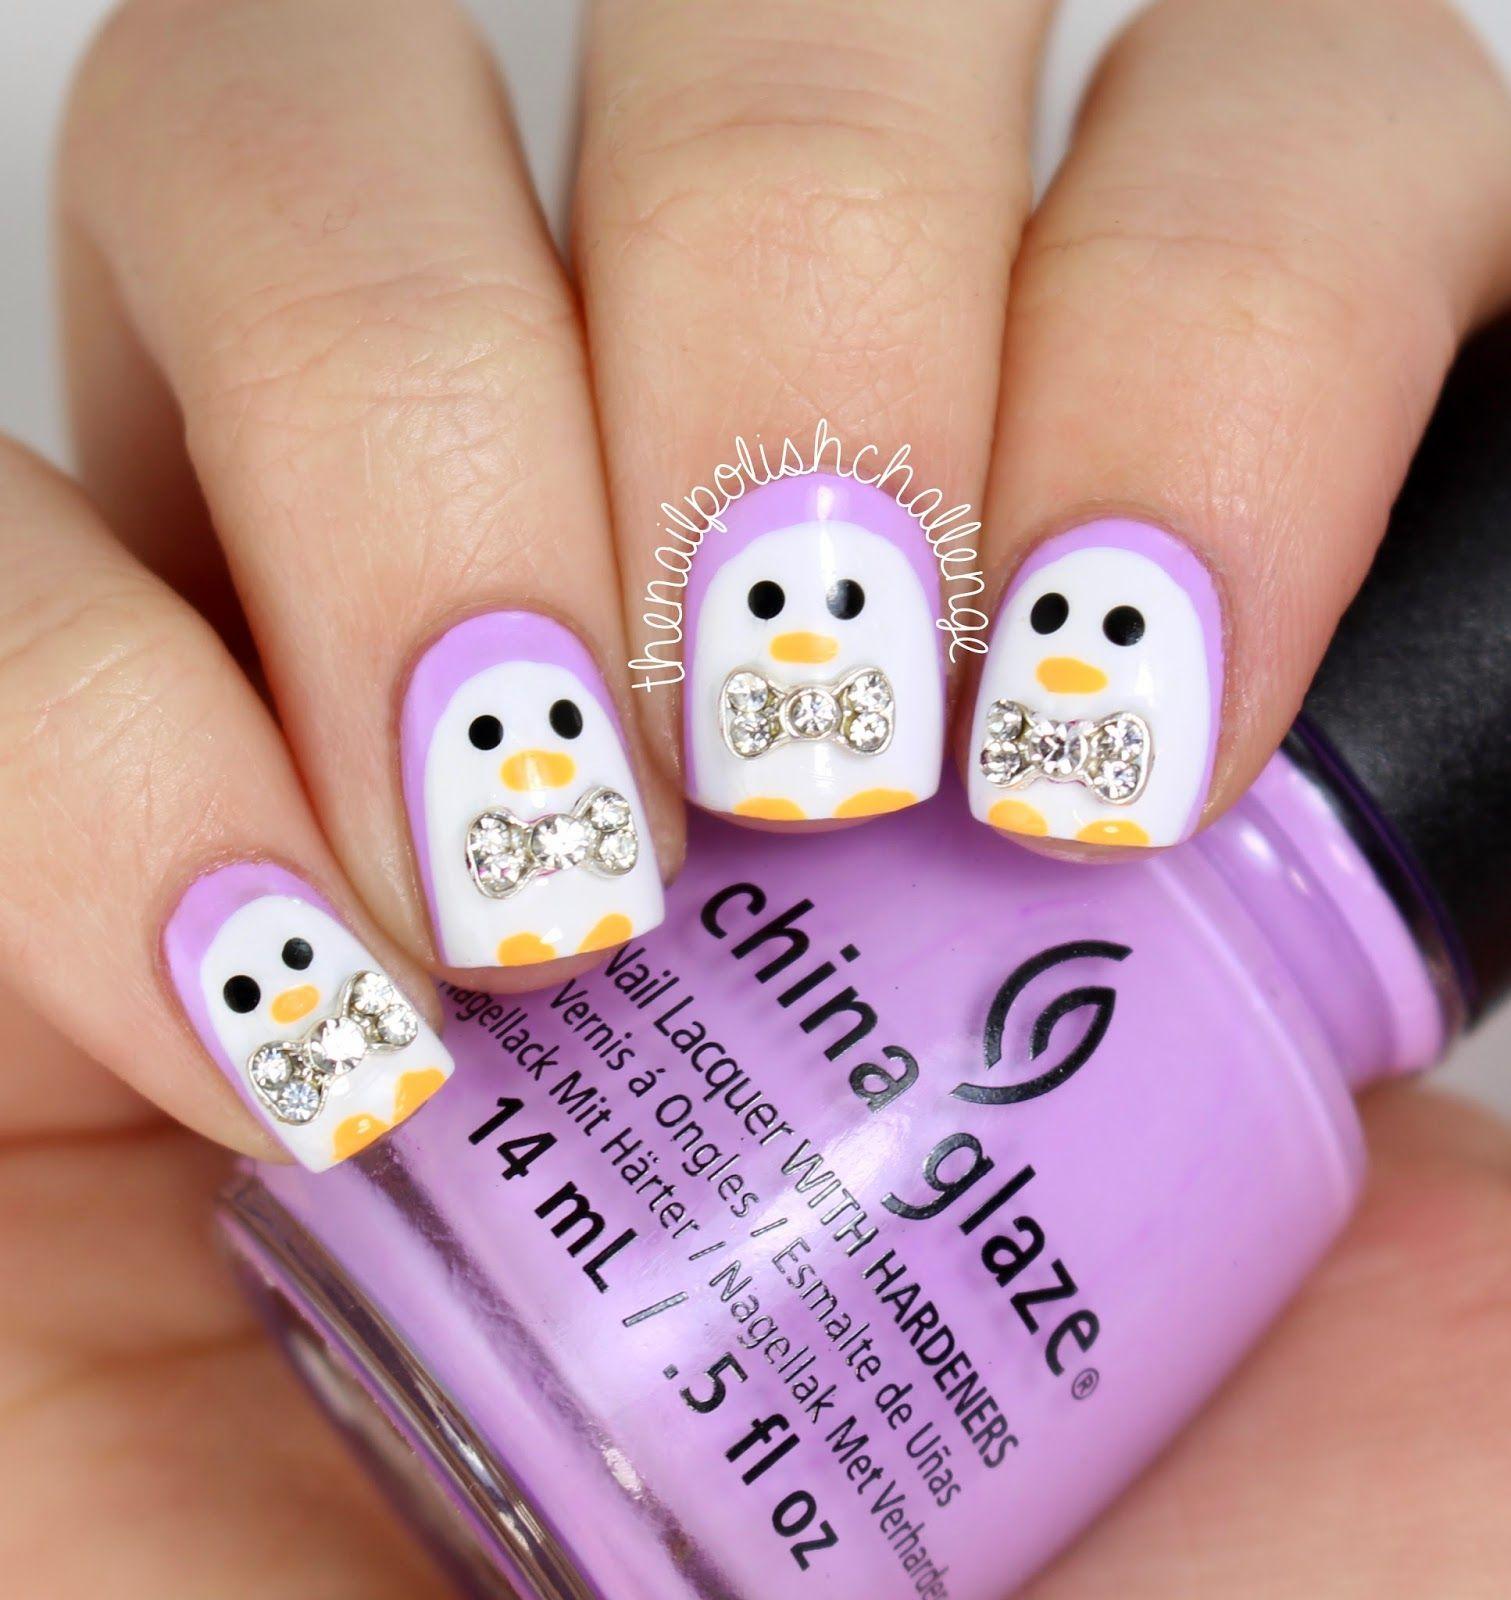 Cute Penguin Nail Art (with 3D bows!) - The Nail Polish Challenge ...